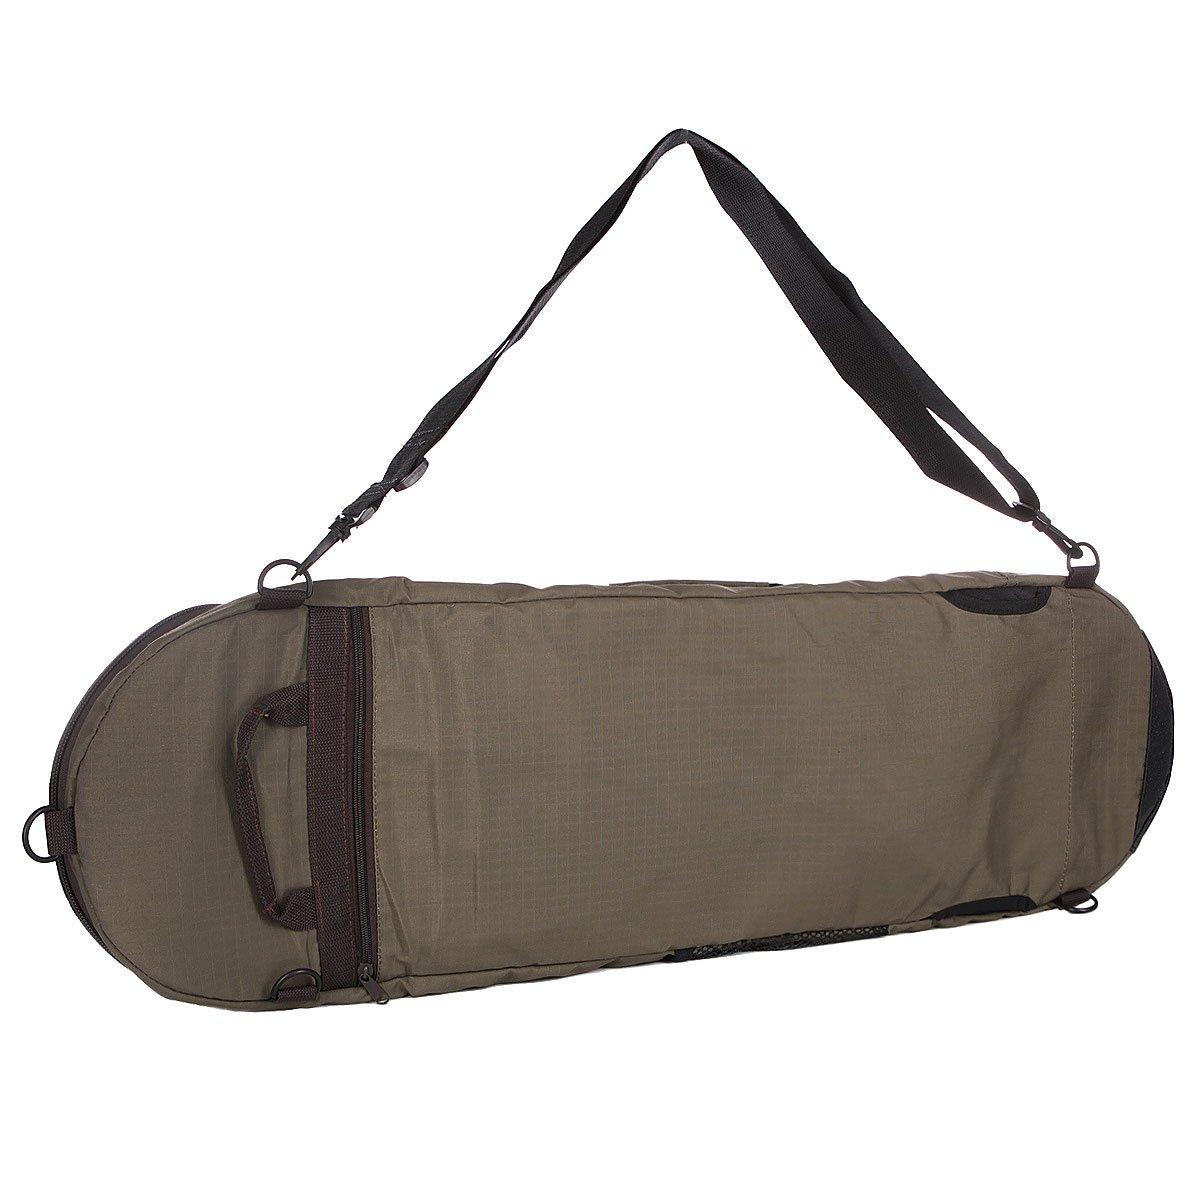 Купить чехол для скейтборда Skate Bag Trip Olive Temp RS в интернет ... 1d40066b3bfc1